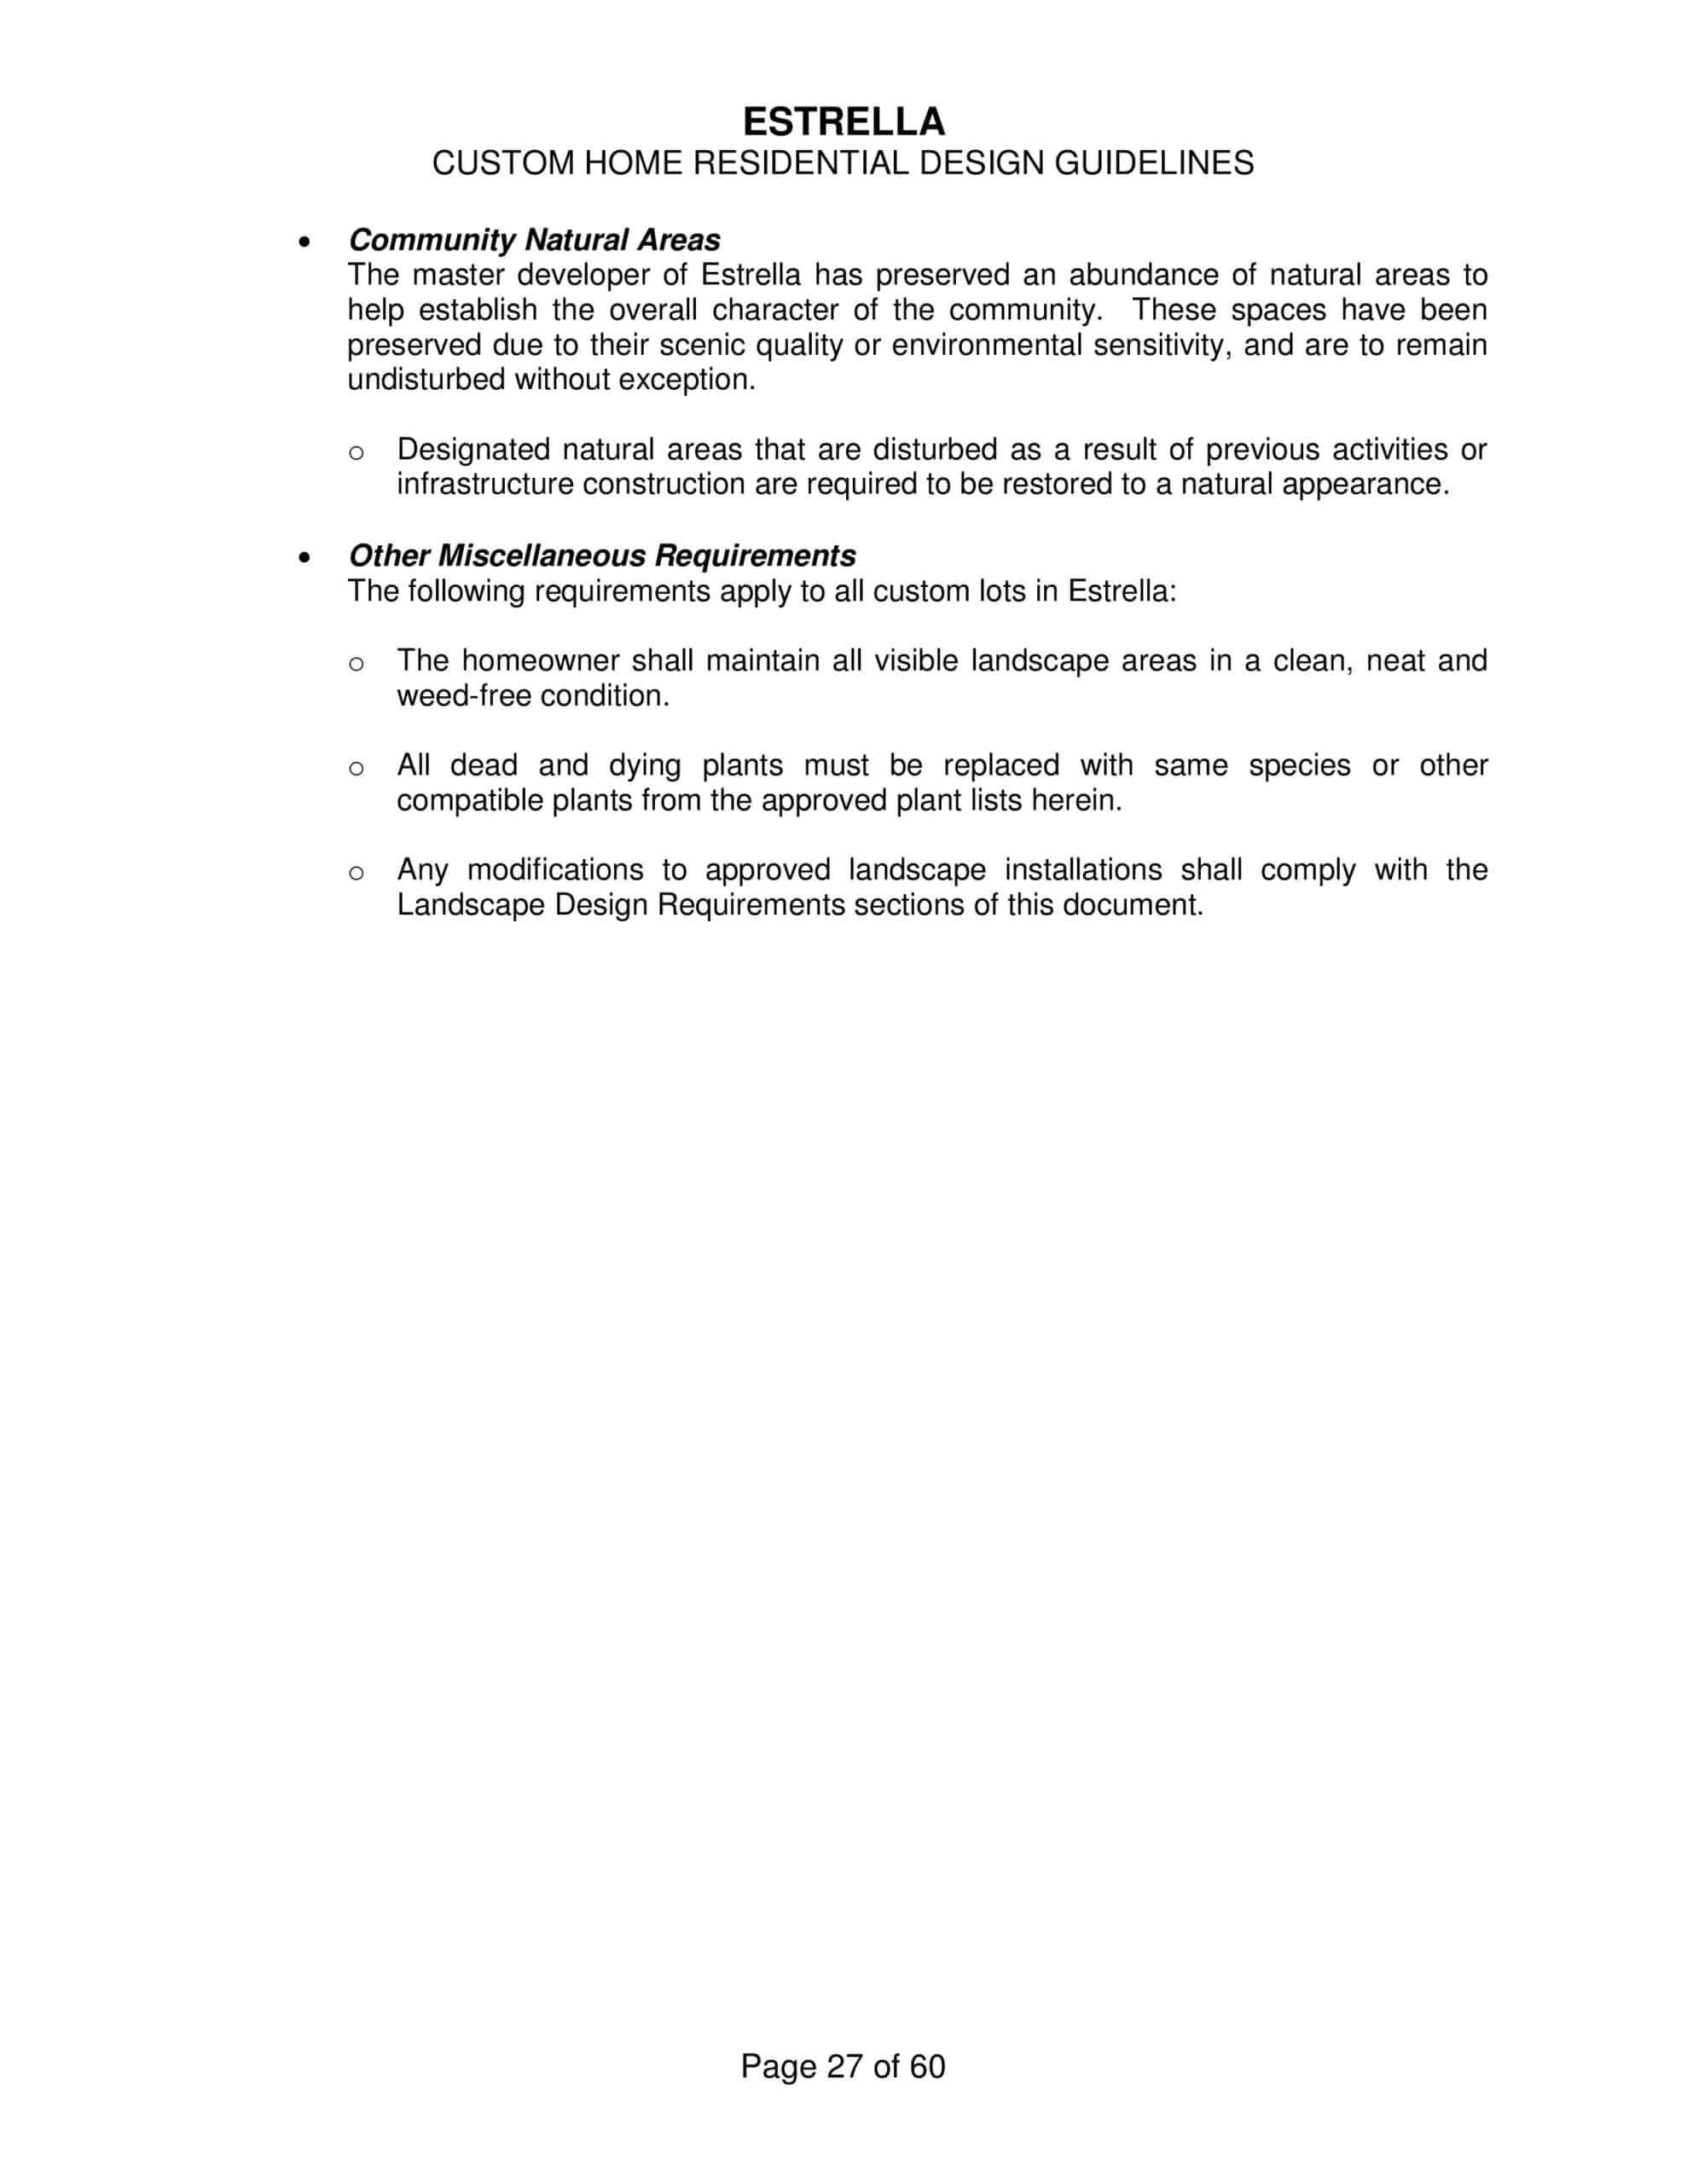 ESTRELLA MOUNTAIN CUSTOM HOME GUIDELINES-page-031